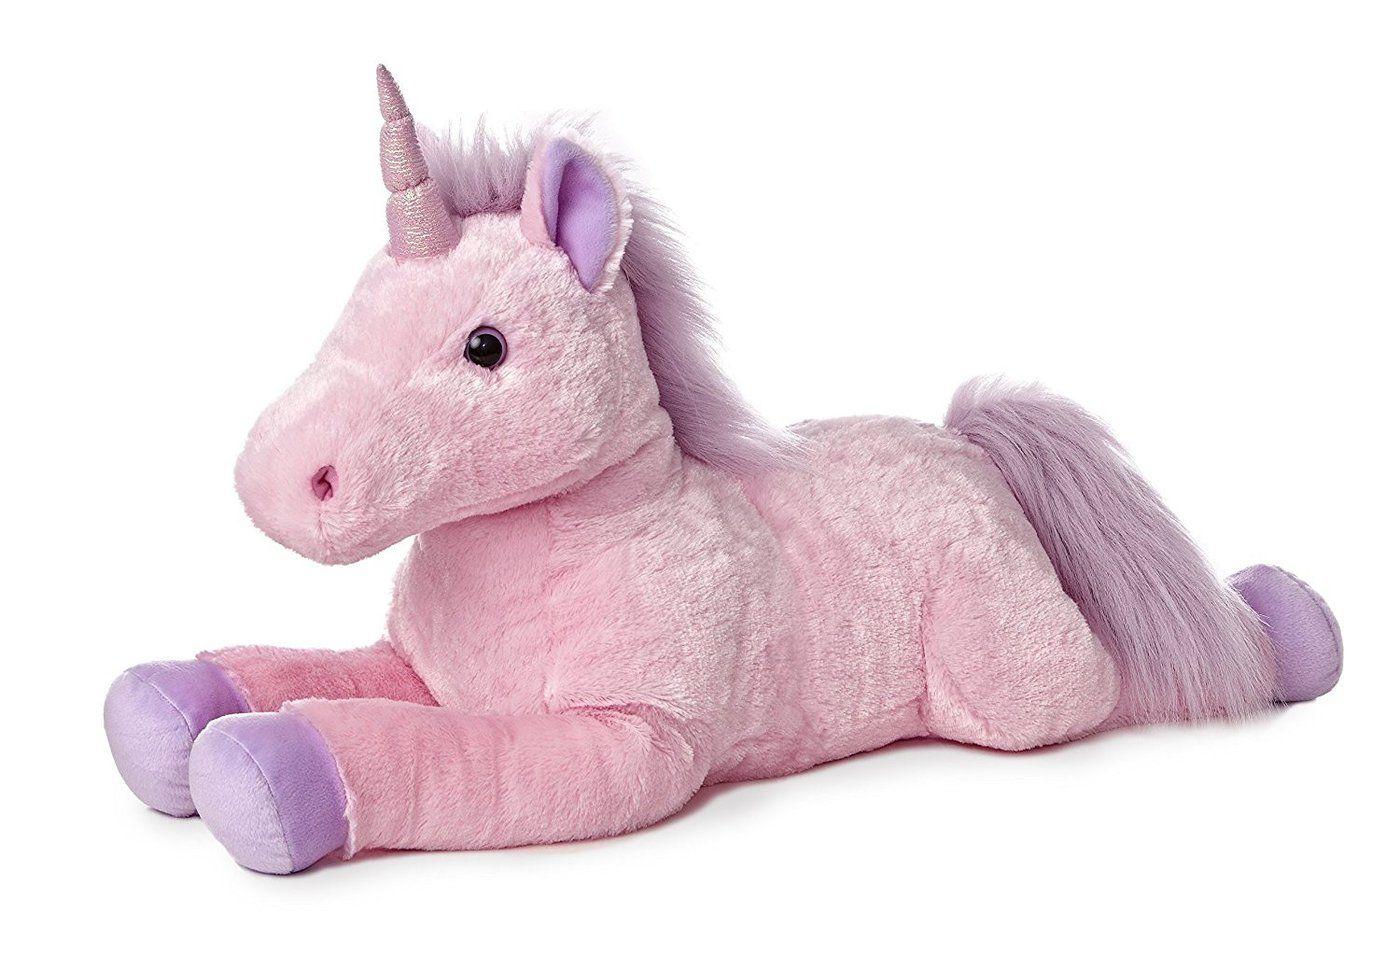 27 Big Unicorn Stuffed Animal Unicorn Stuffed Animal Teddy Bear Stuffed Animal Unicorn Plush [ 955 x 1400 Pixel ]